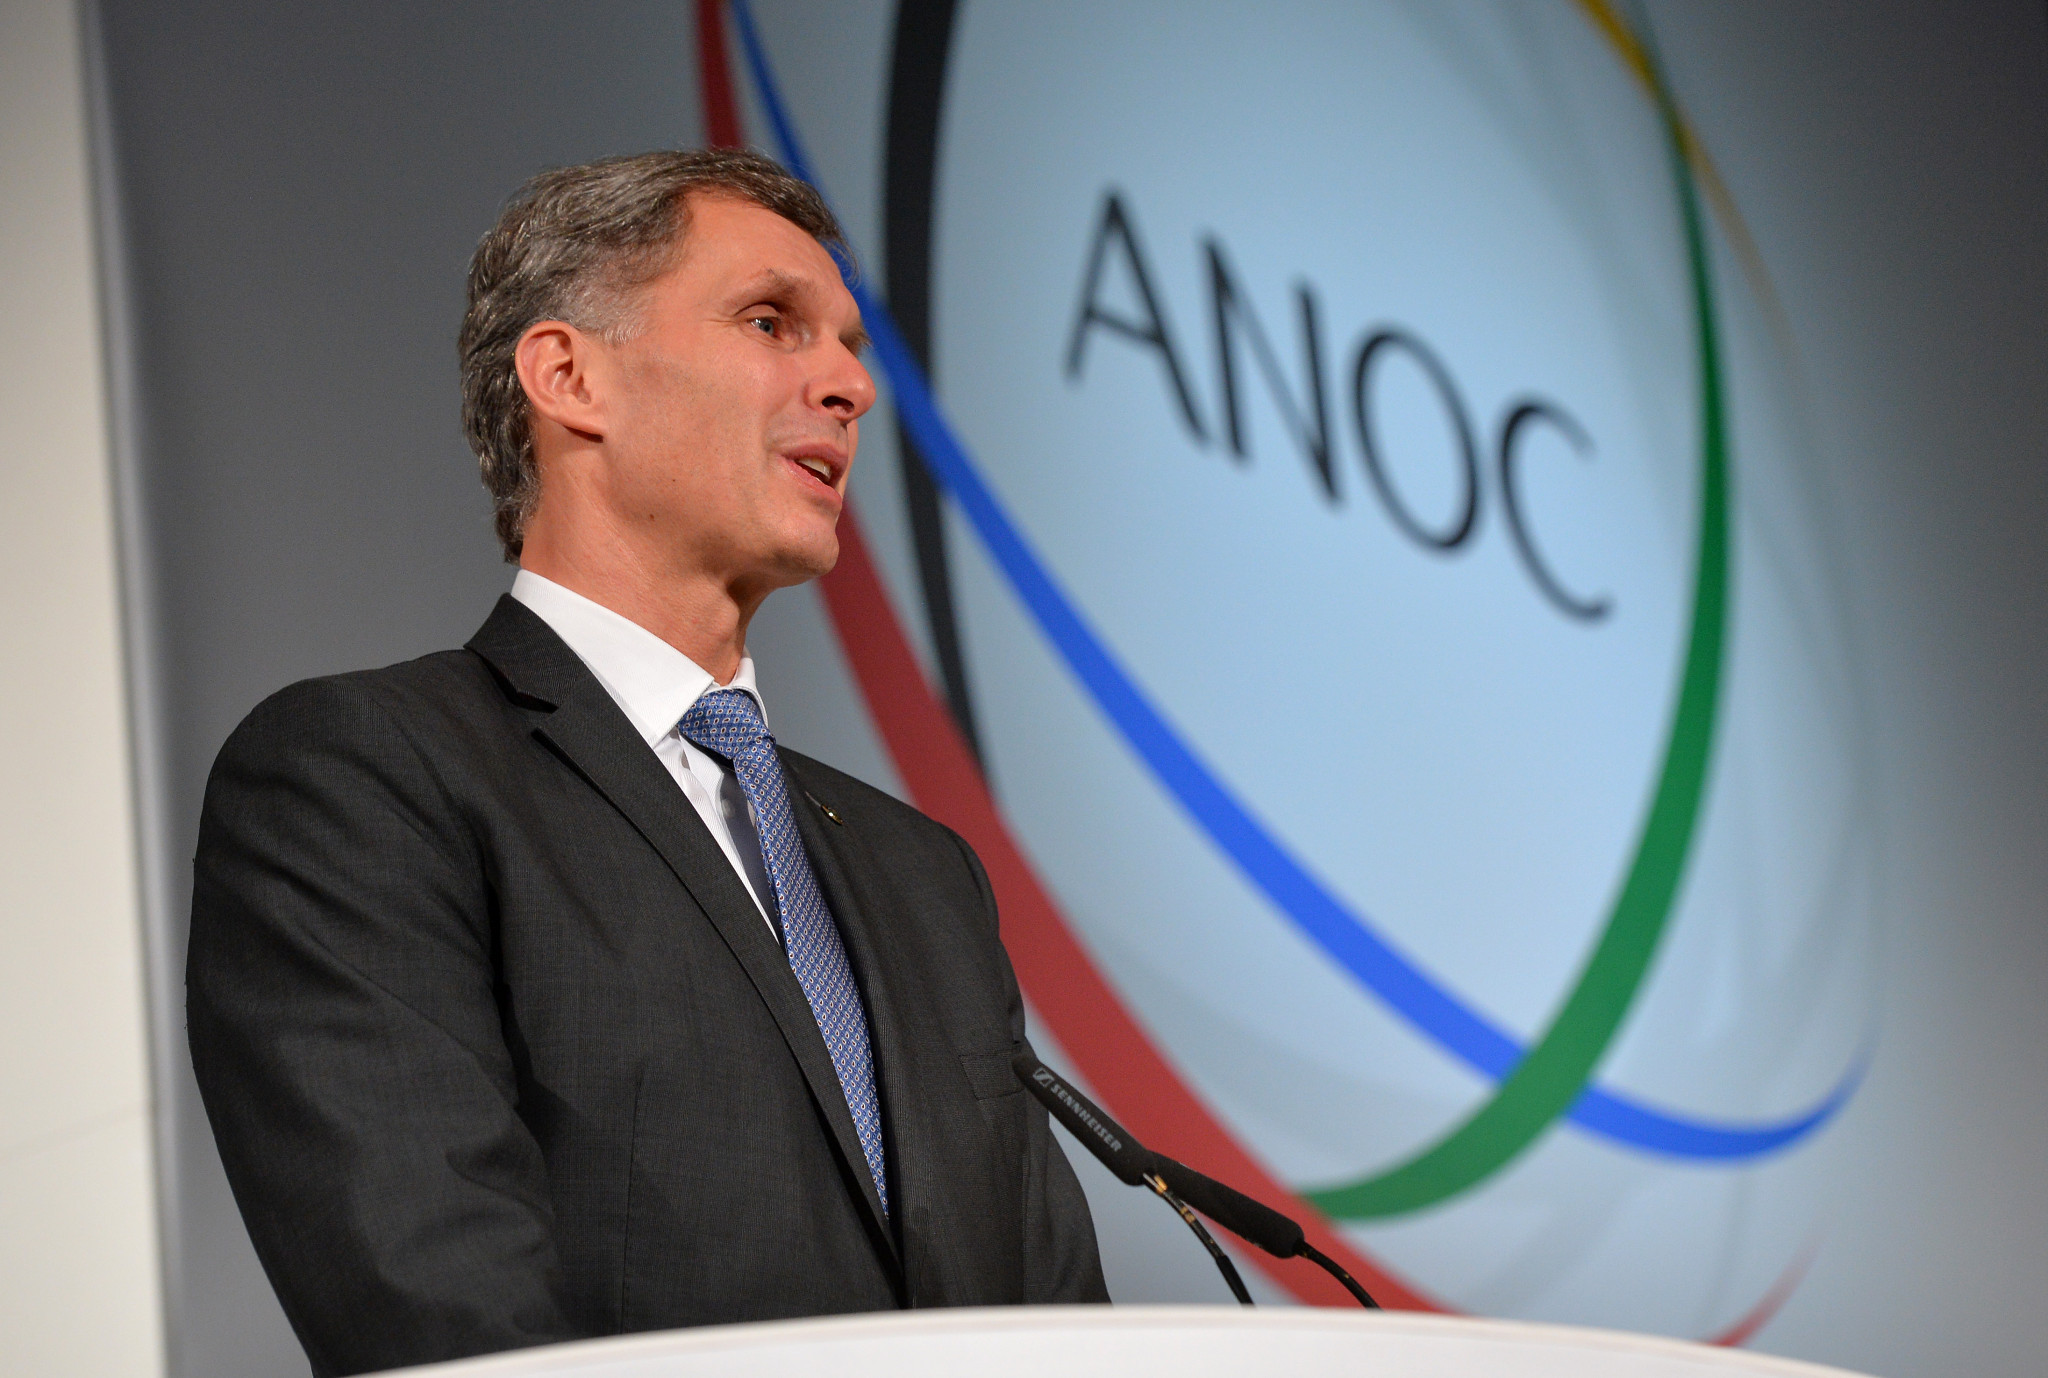 Czech Olympic Committee President Jiri Kejval said